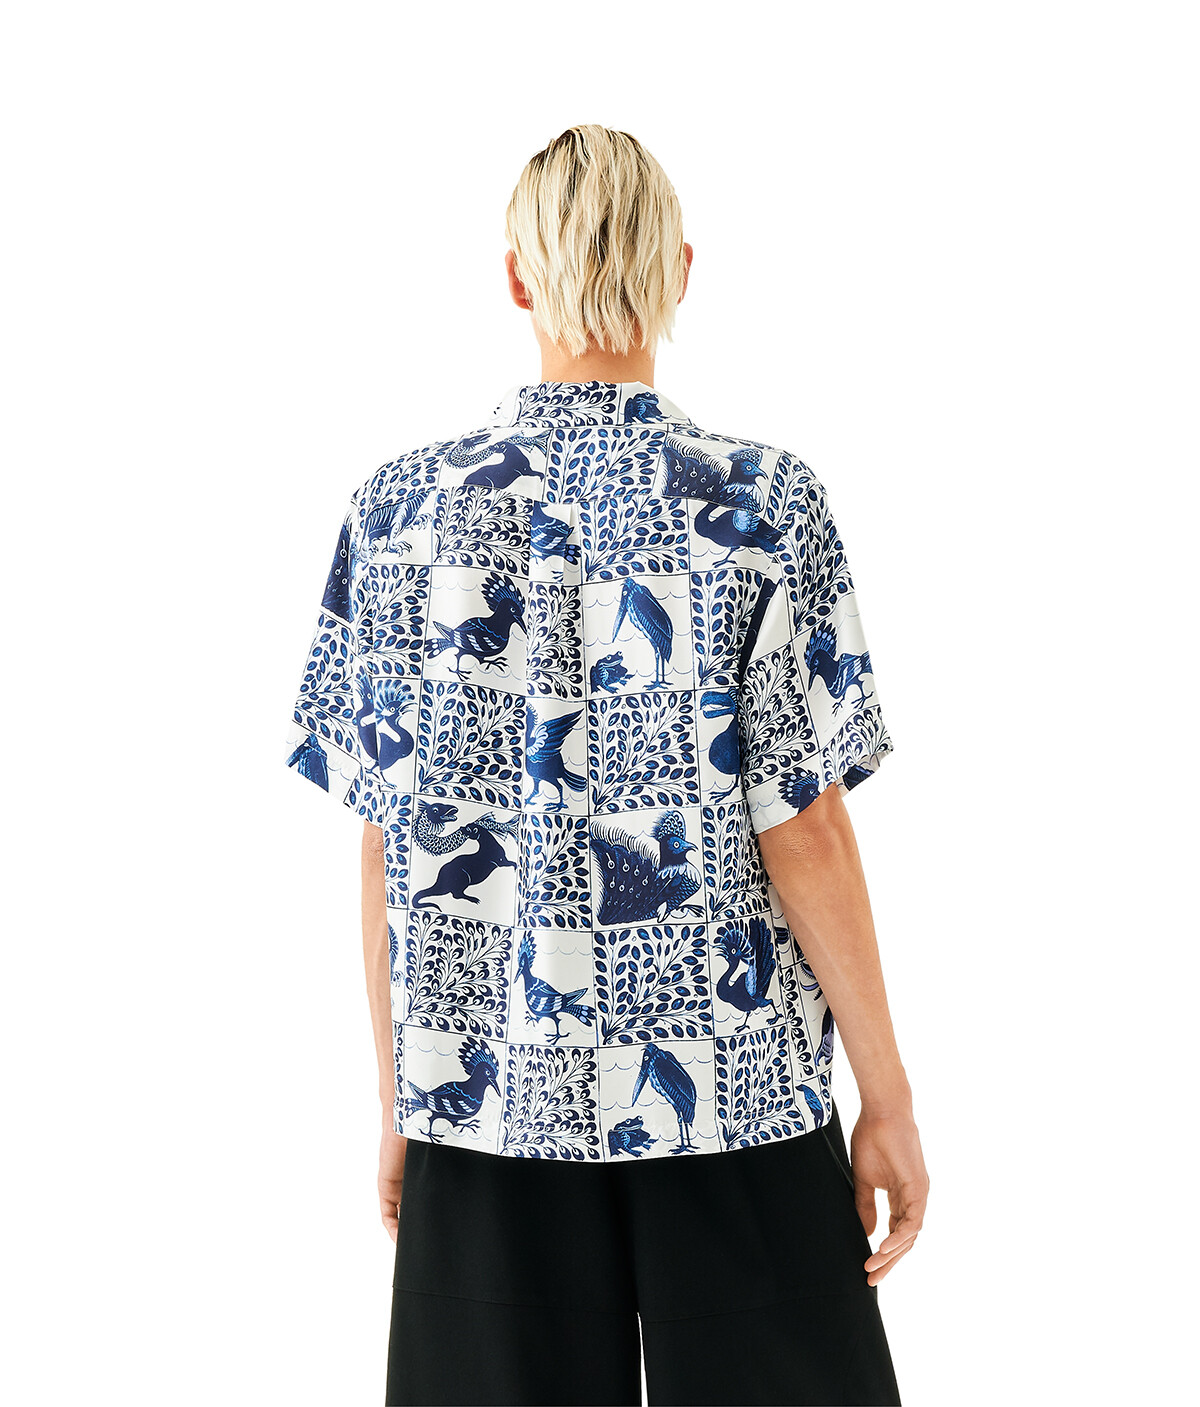 LOEWE Bowling Shirt Azul/Blanco front